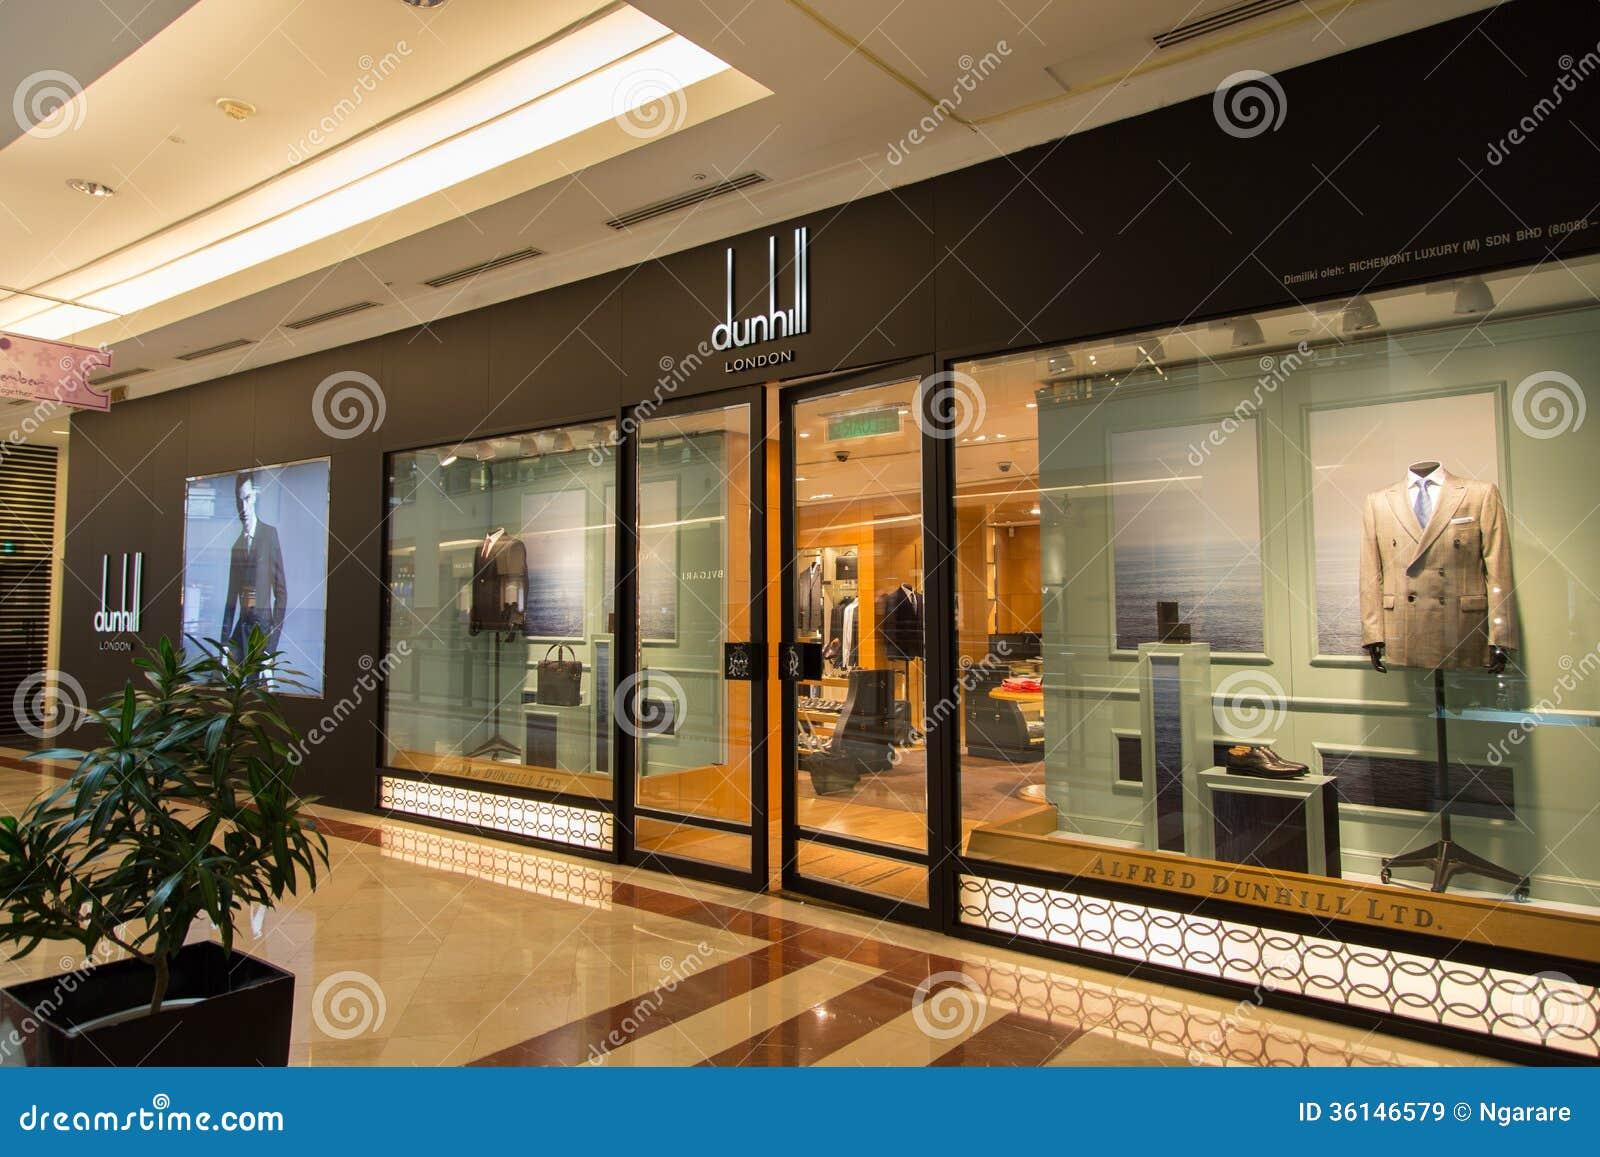 Kuala Lumpur Malaysia Sep 27 Dunhill Shop In Suria Shopping Editorial Stock Image Image